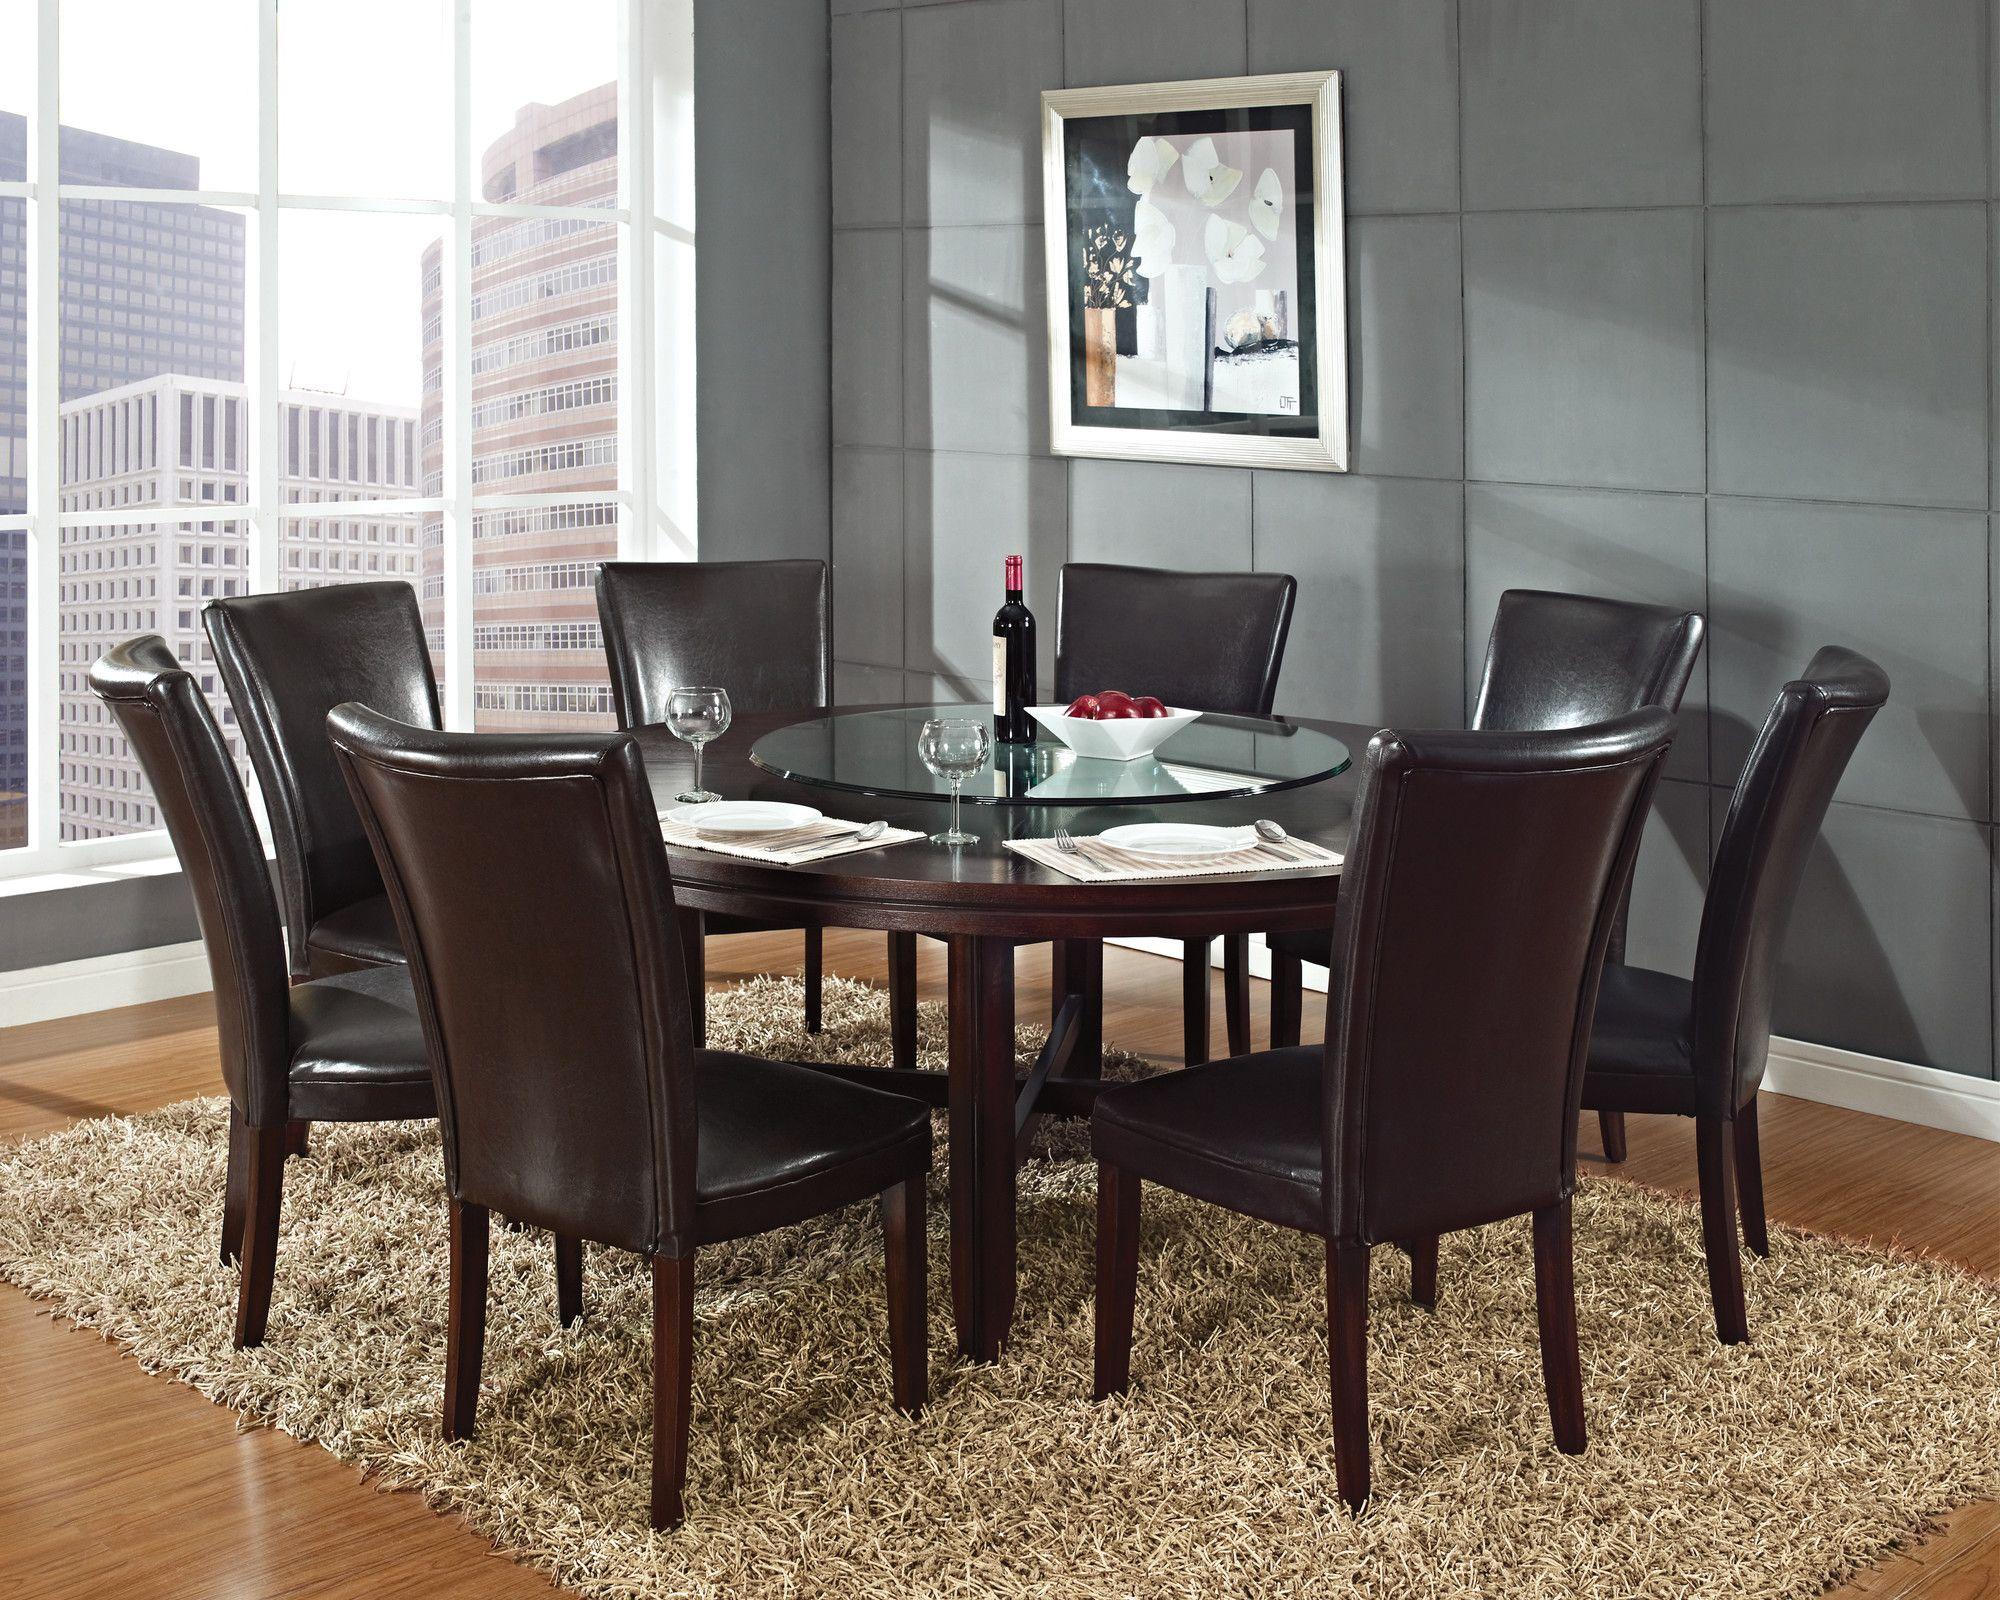 Hartford Dining Table Wayfair Round Dining Room Sets 72 Inch Round Dining Table Round Dining Table Sets